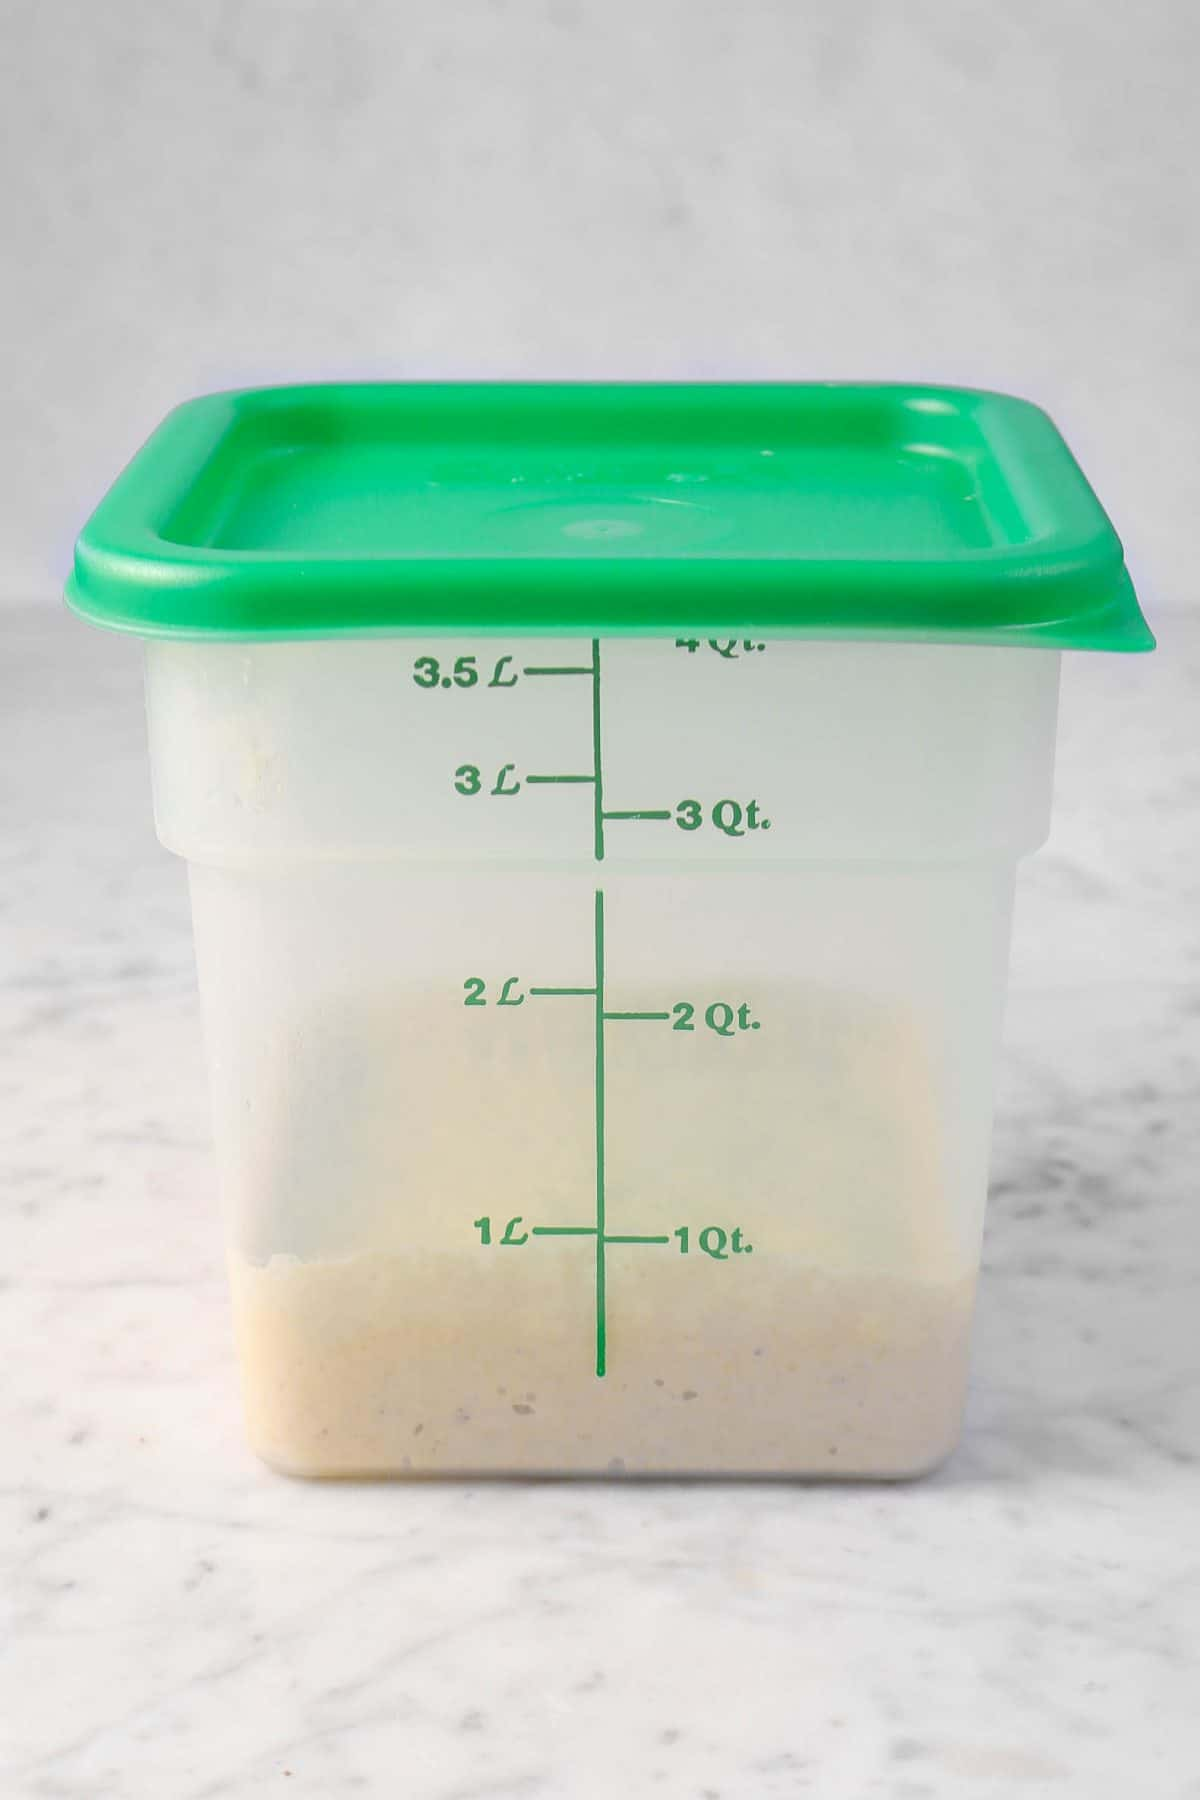 dough in a dough rising bucket on a marble counter